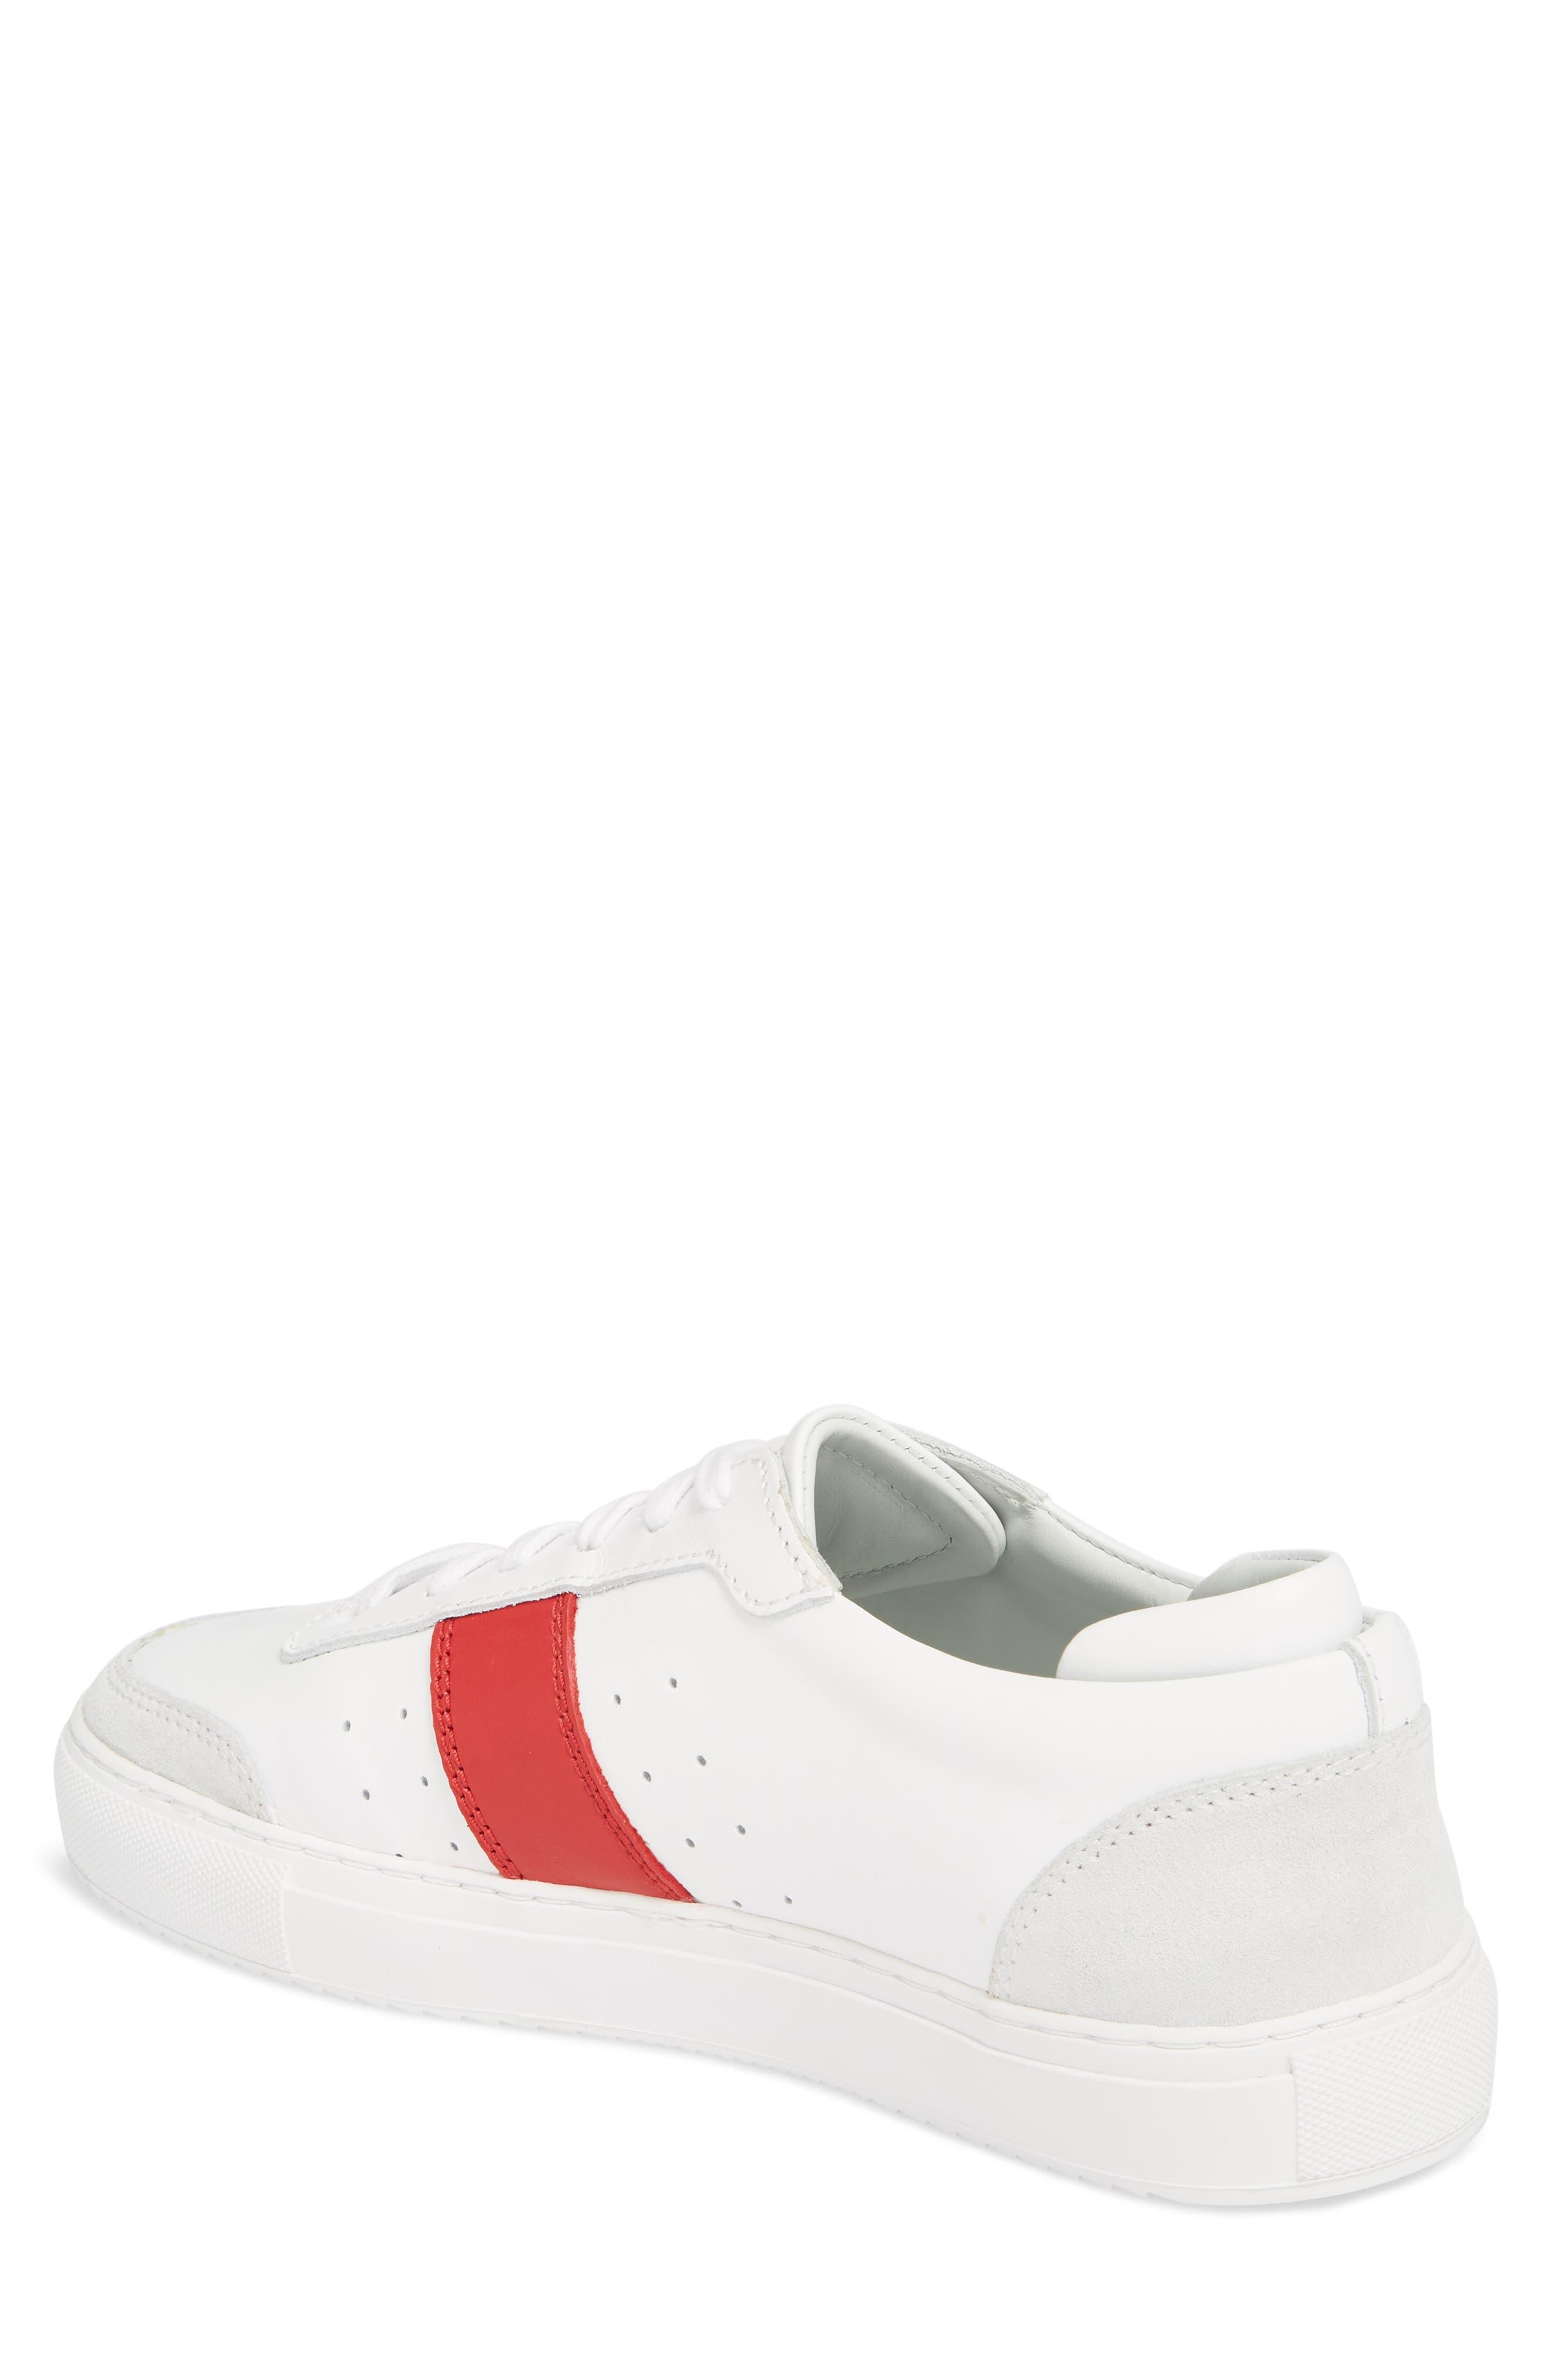 Dunk Striped Sneaker,                             Alternate thumbnail 2, color,